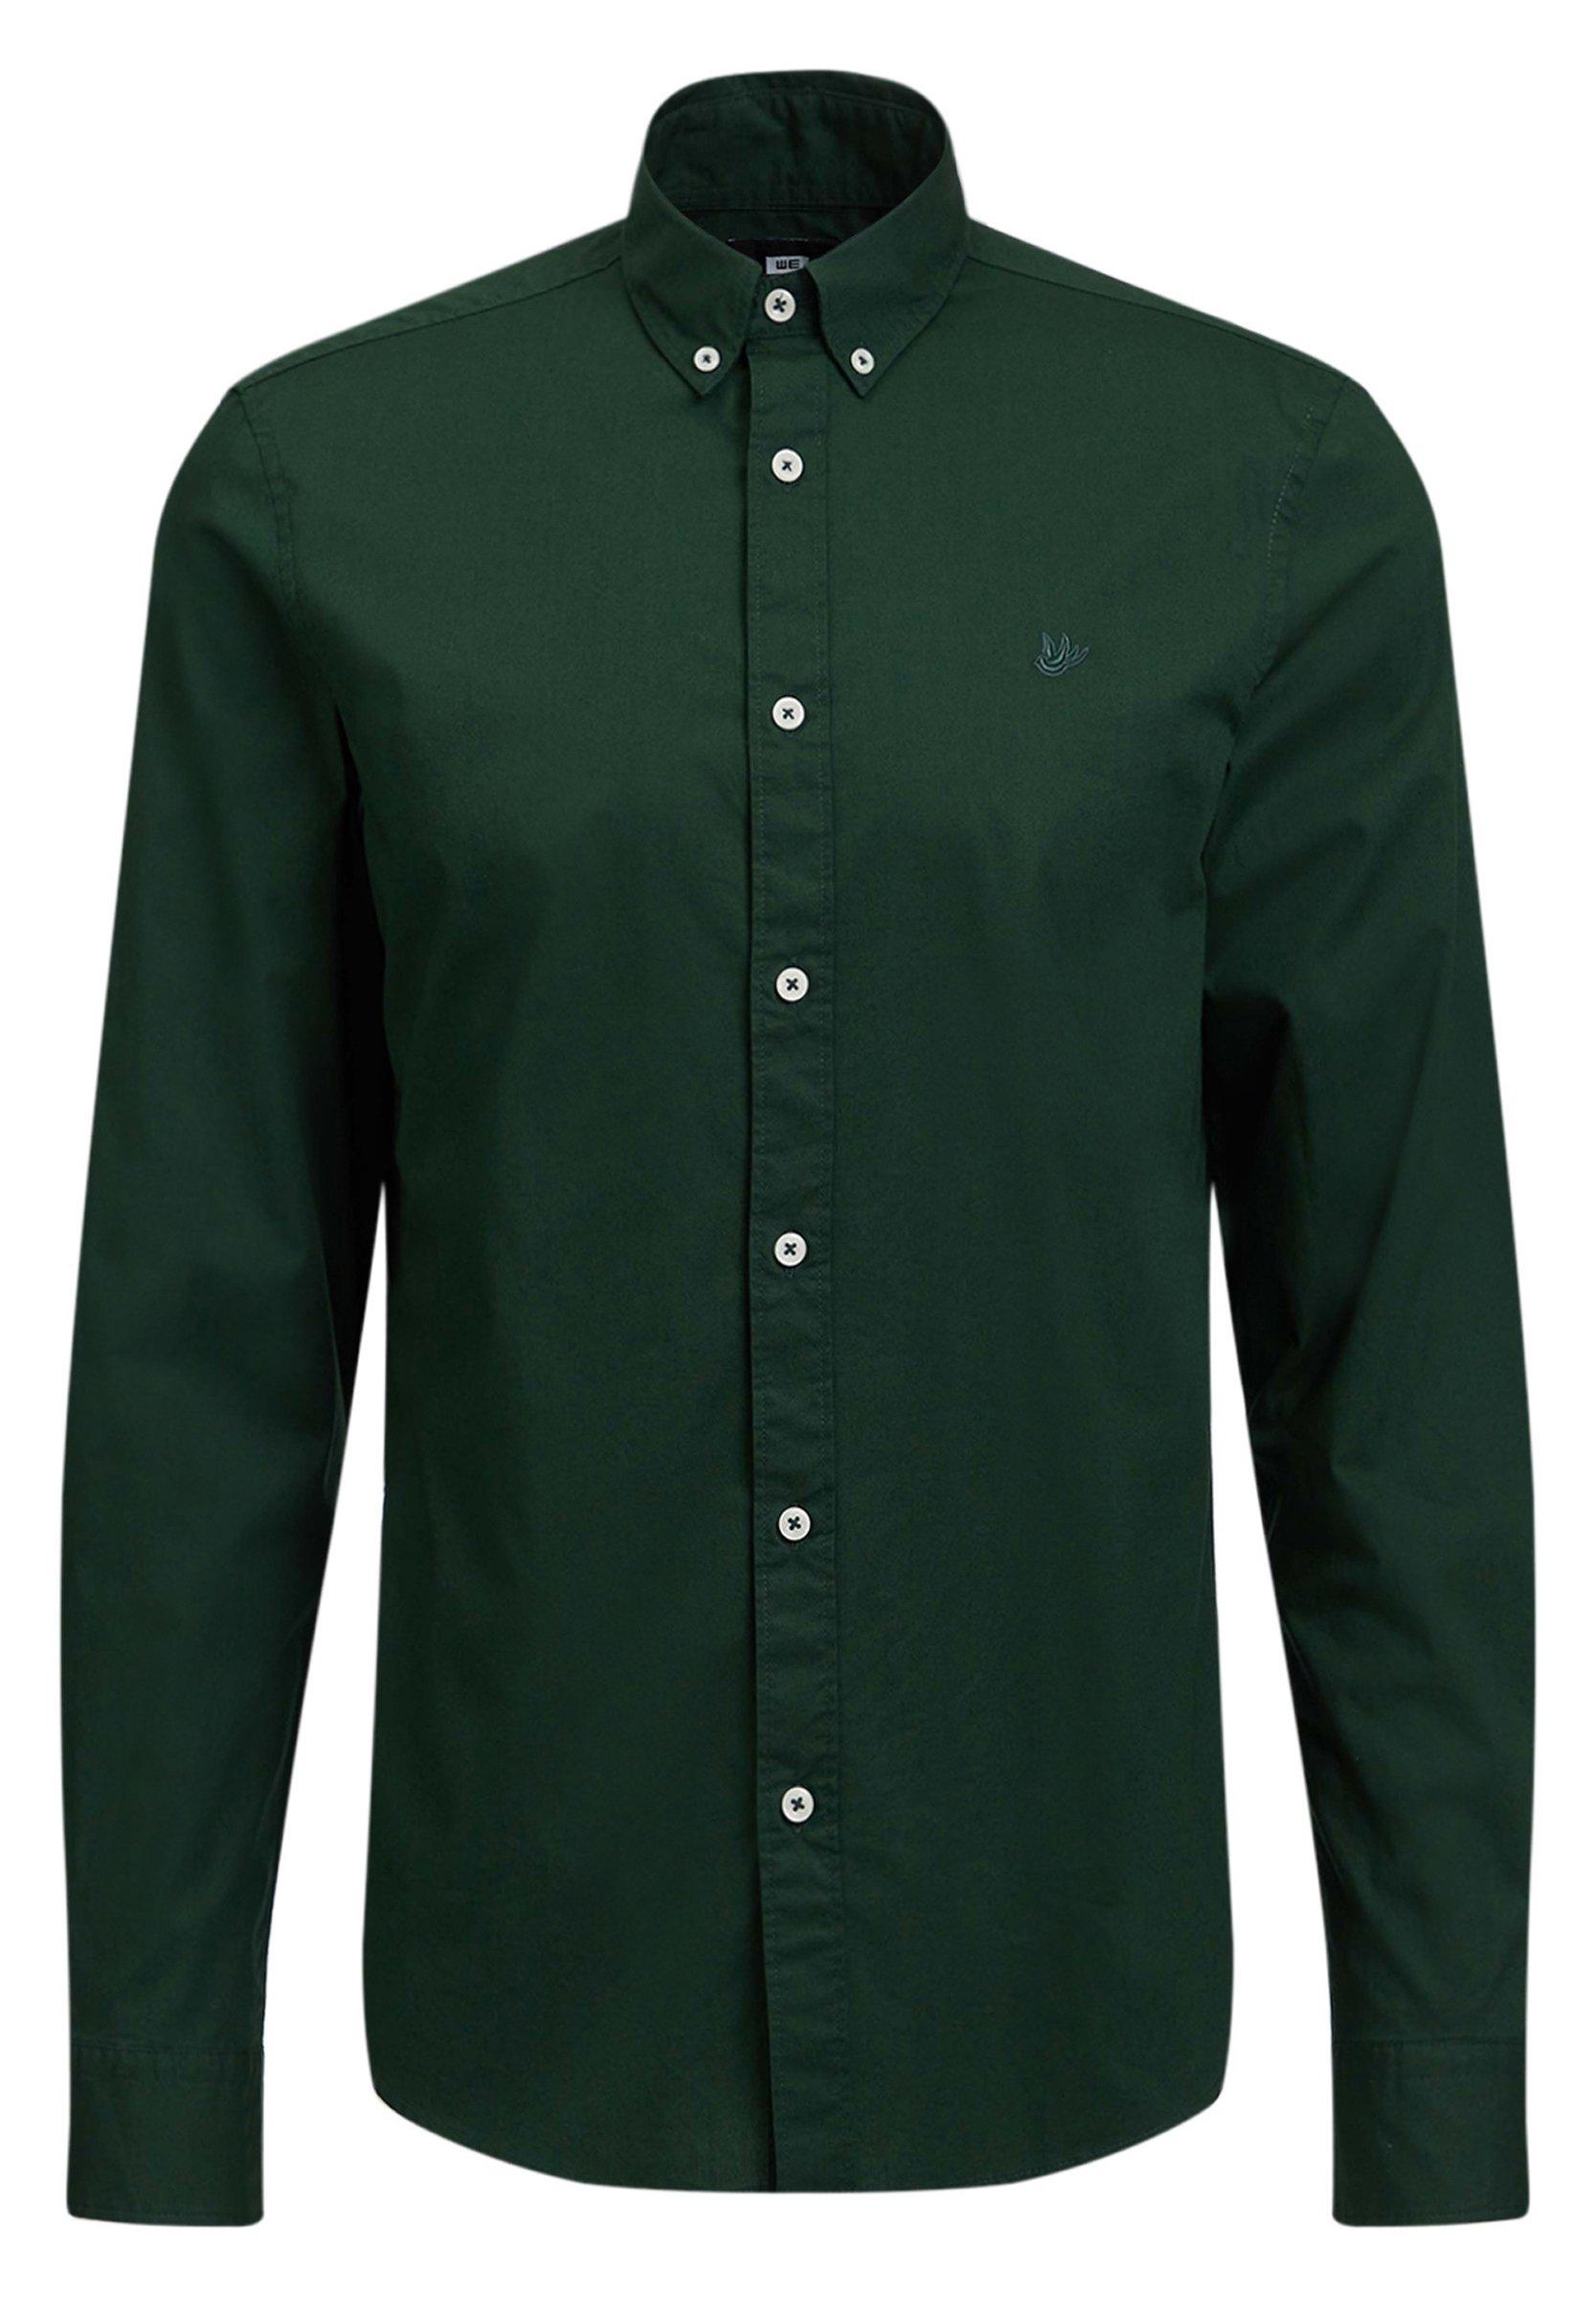 We Fashion Hemd - Dark Green